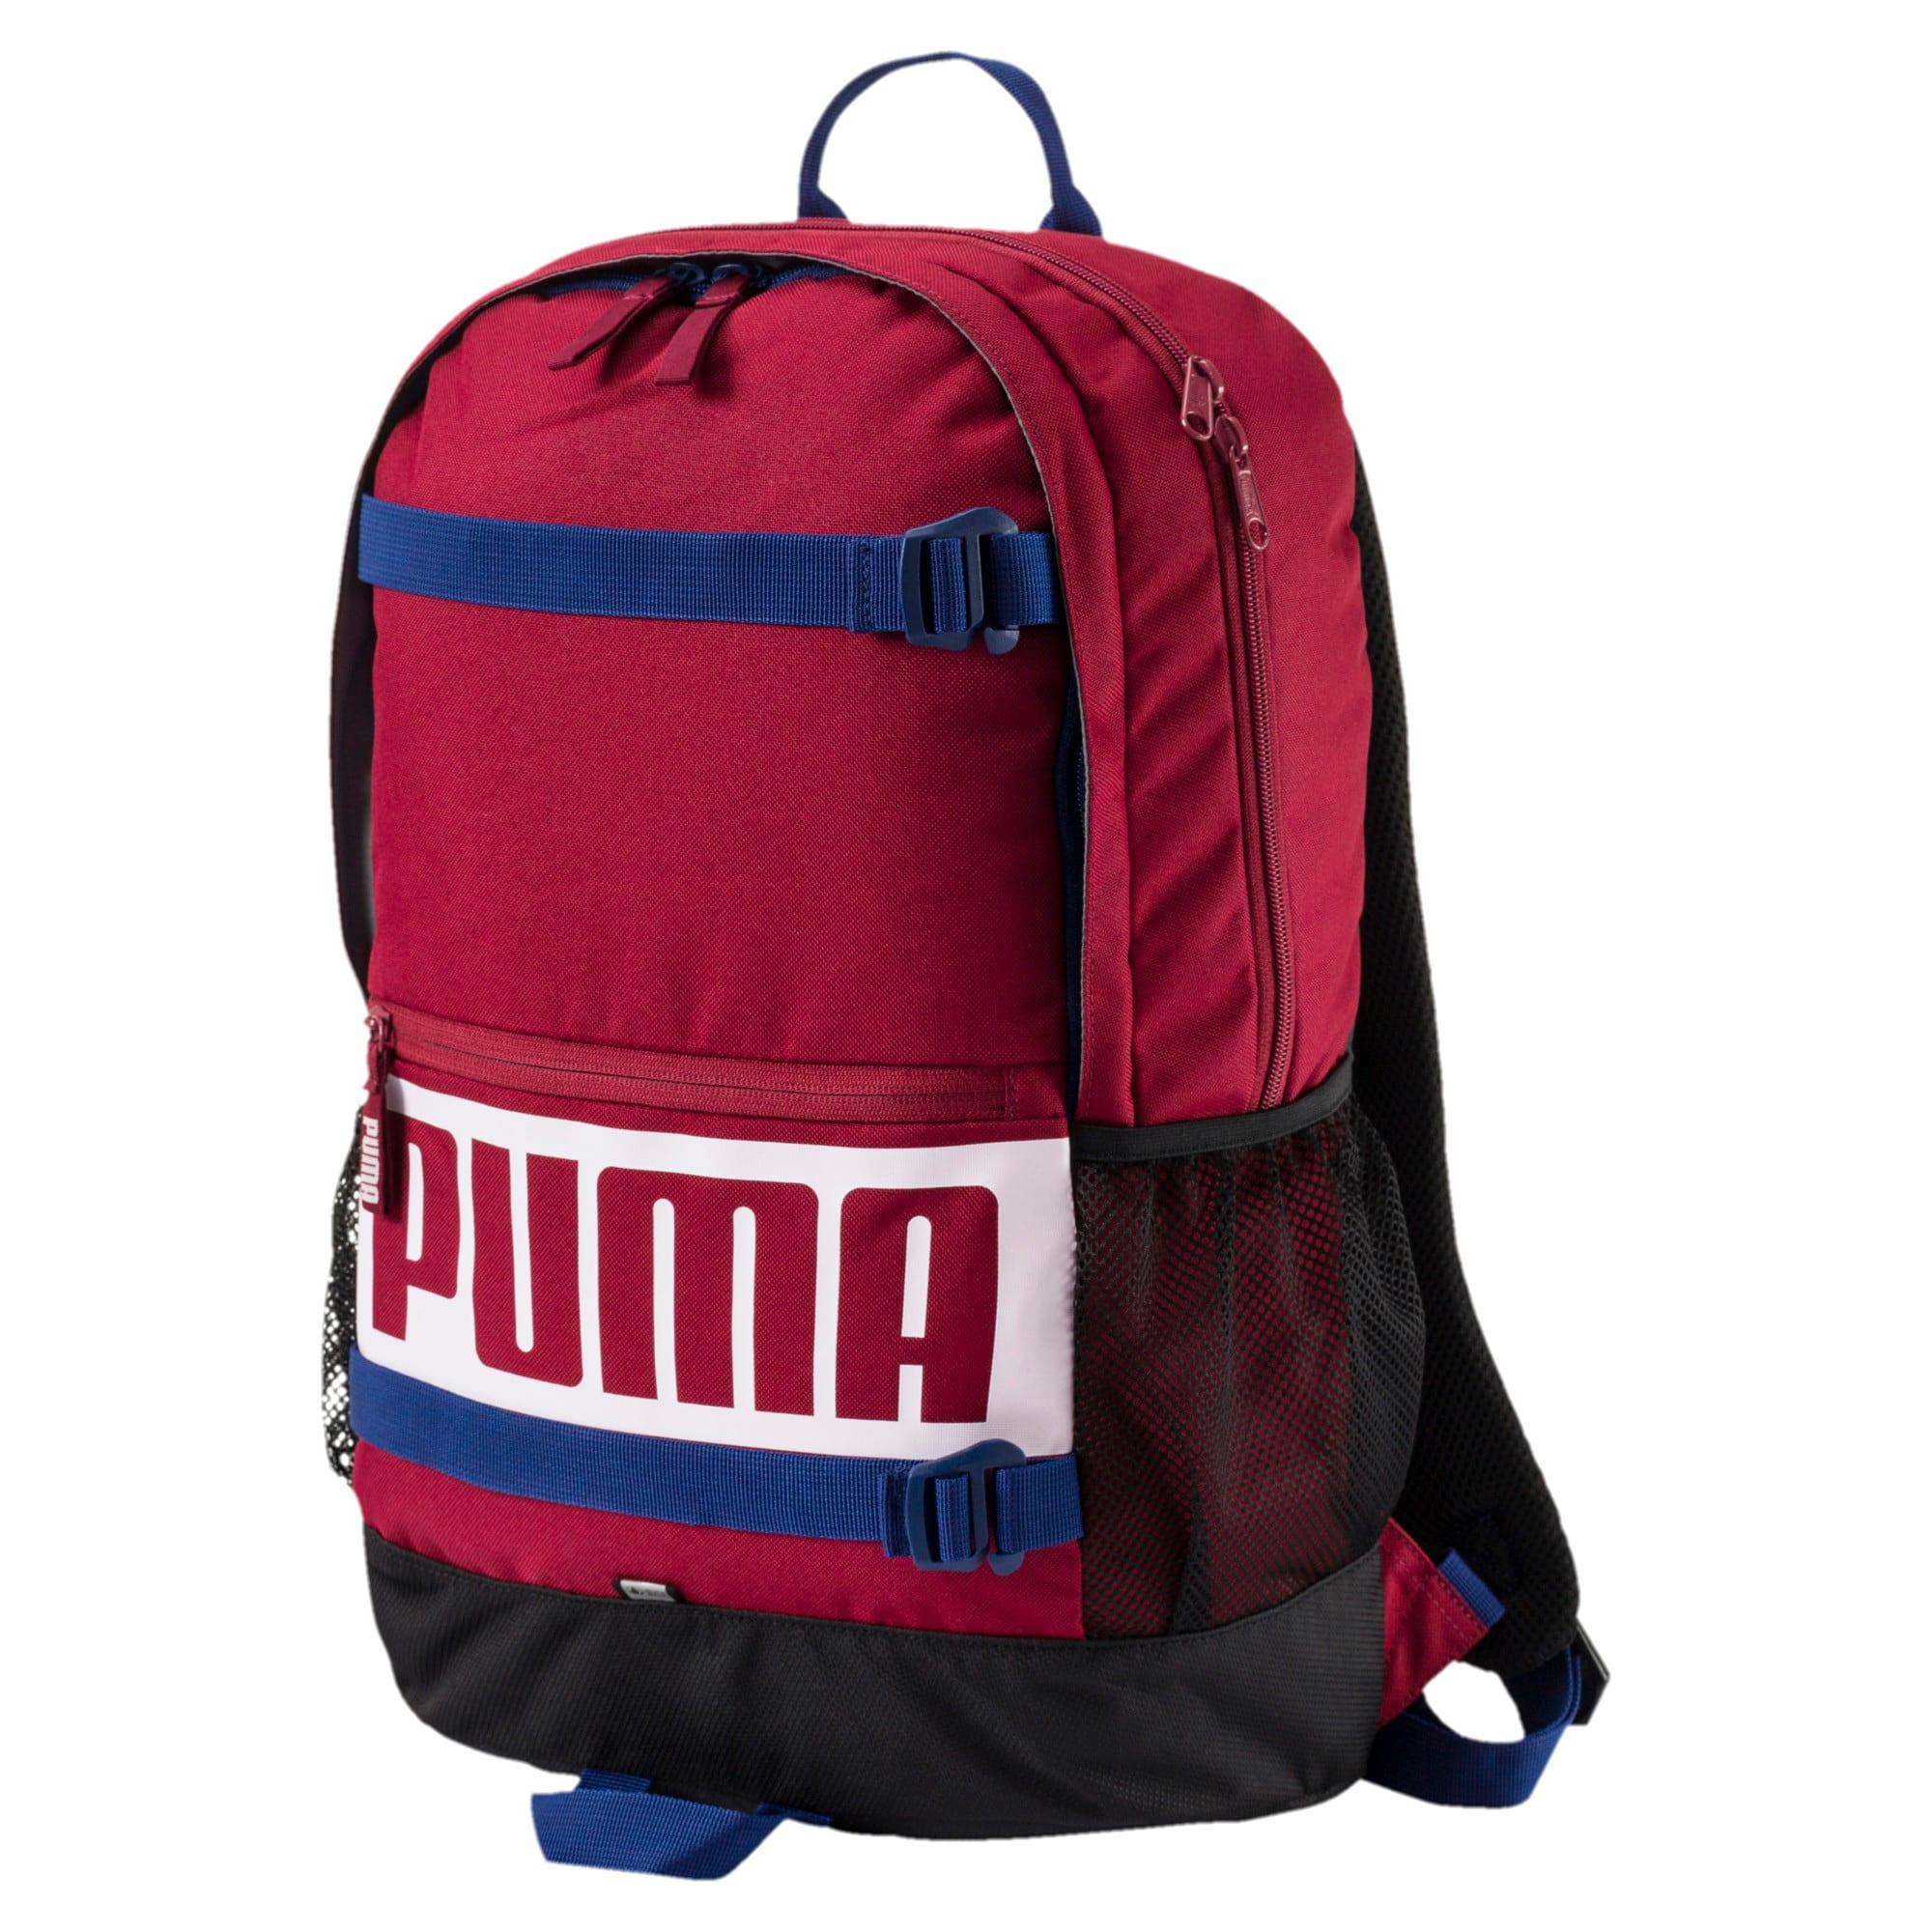 Thumbnail 1 of Deck Backpack, Tibetan Red, medium-IND